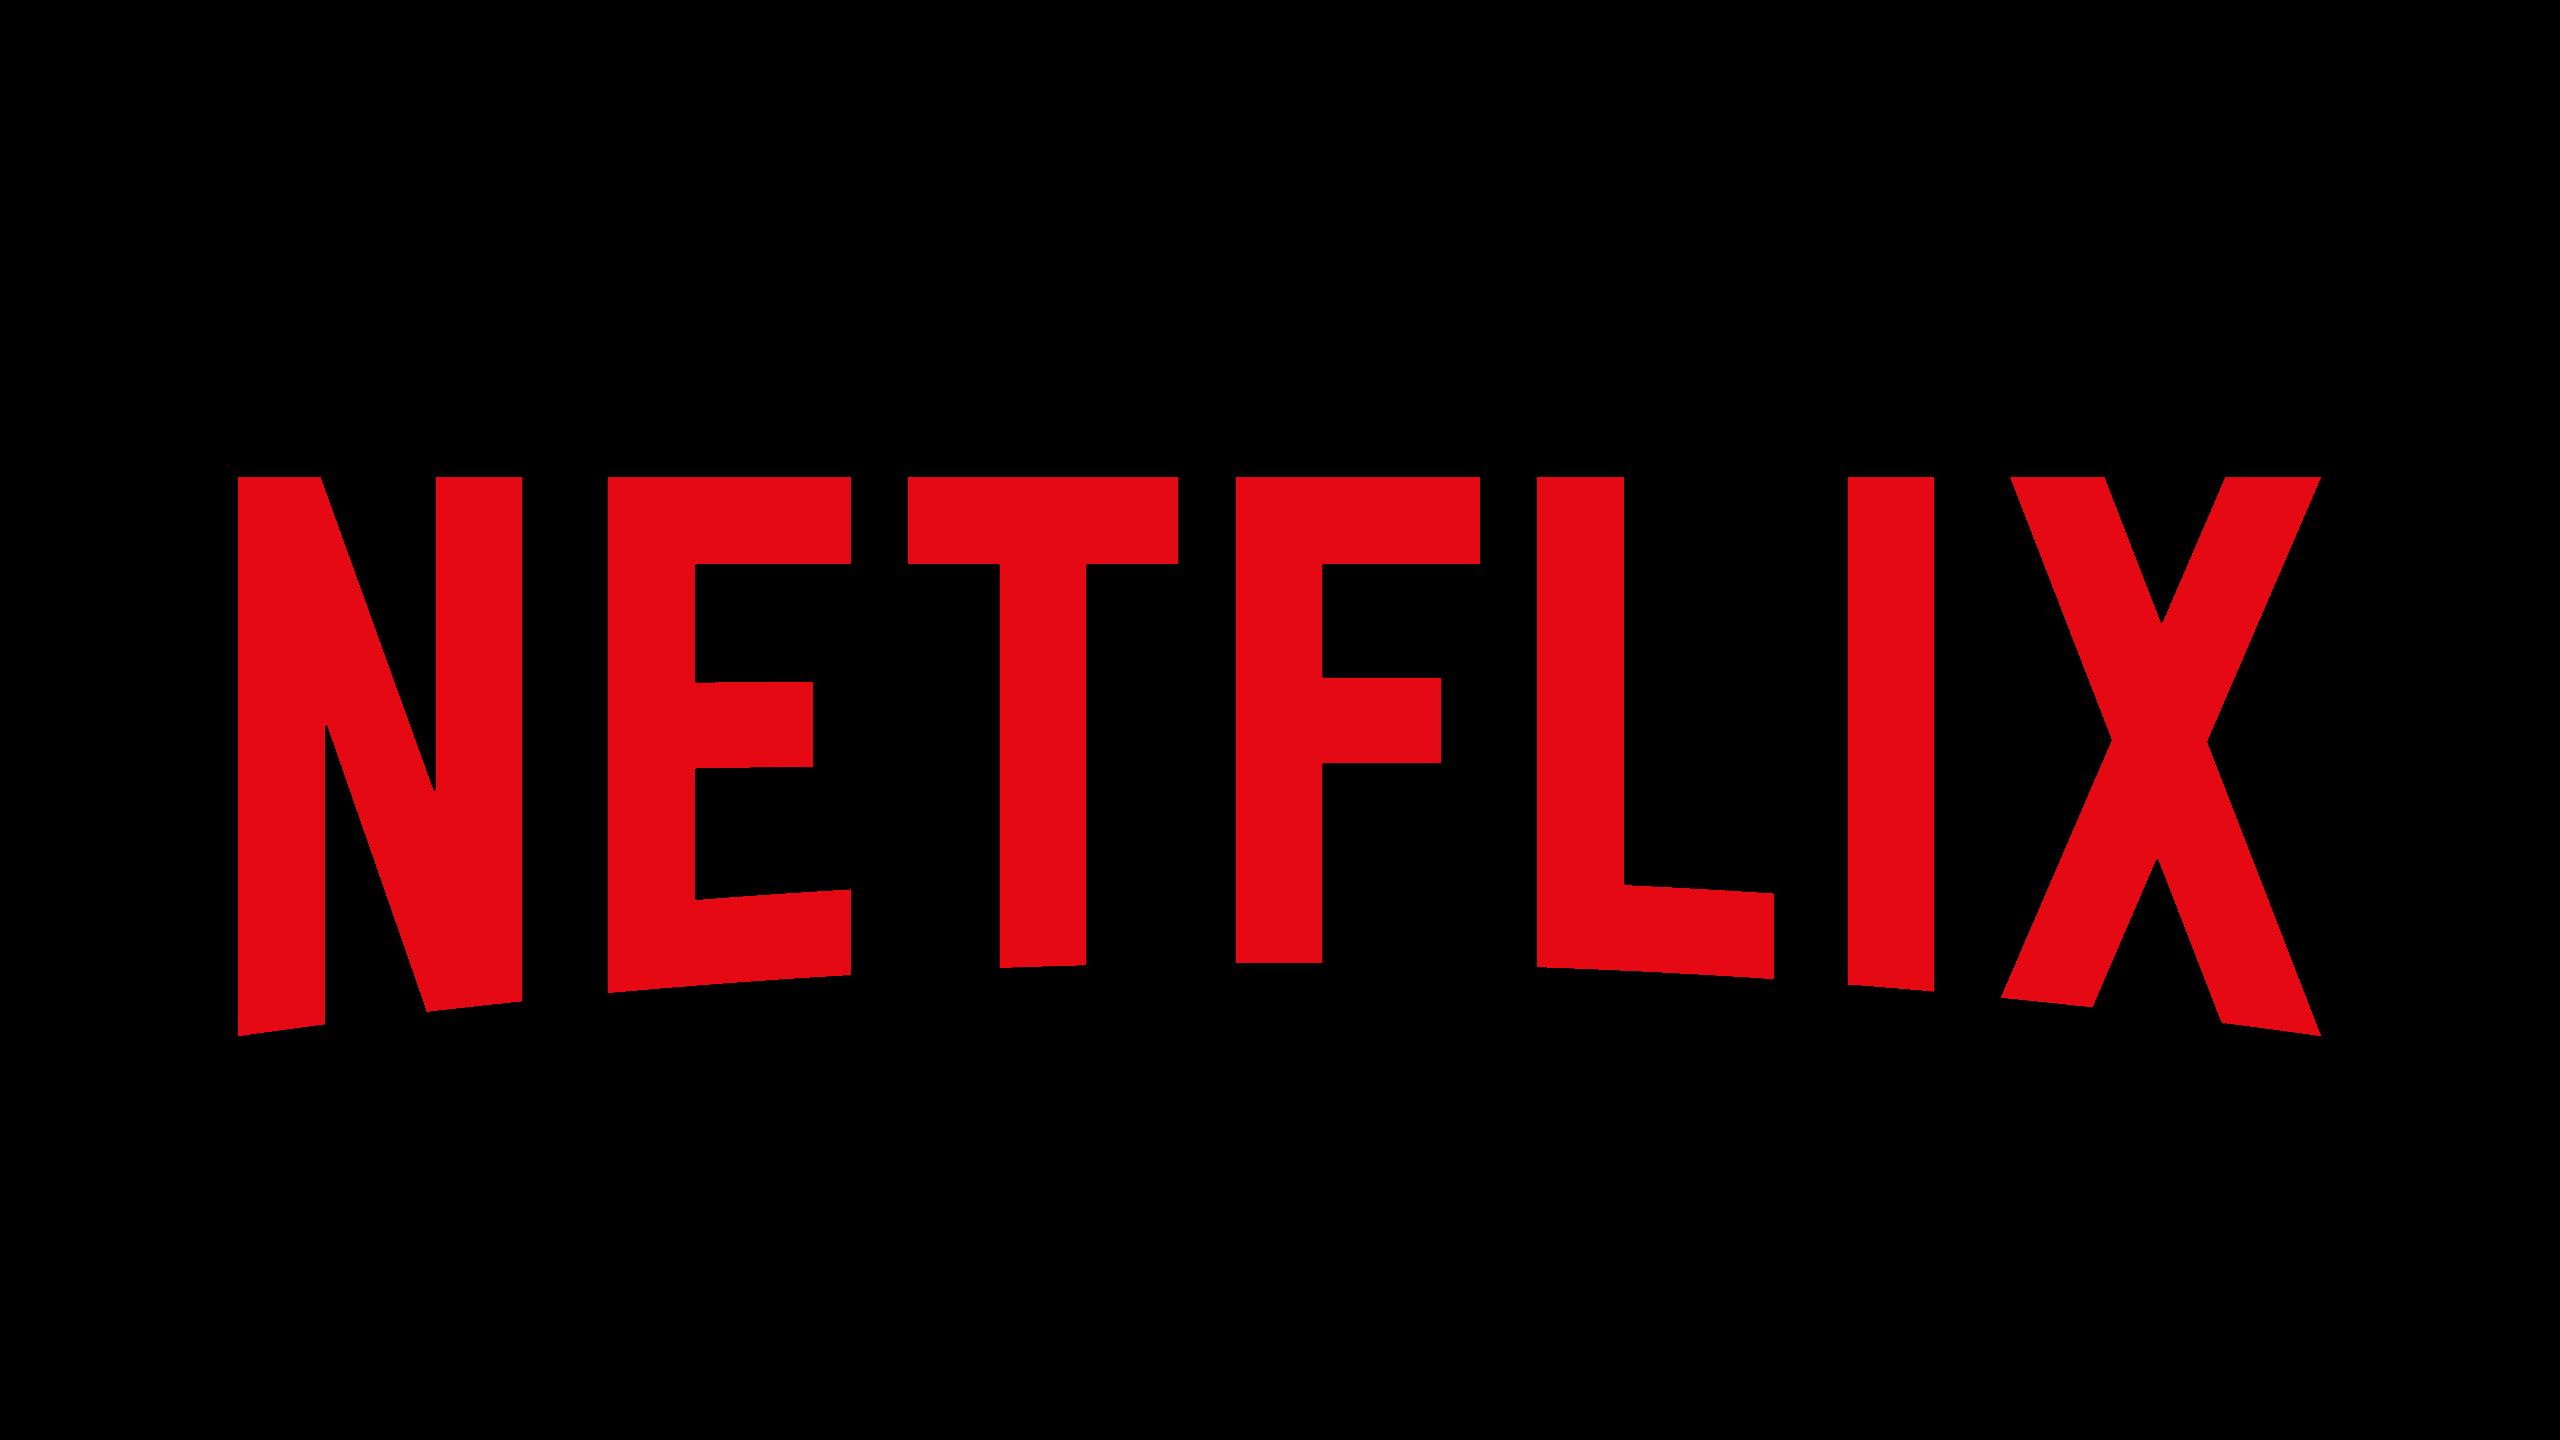 Netflix to drop So Not Worth It Season 1 soon